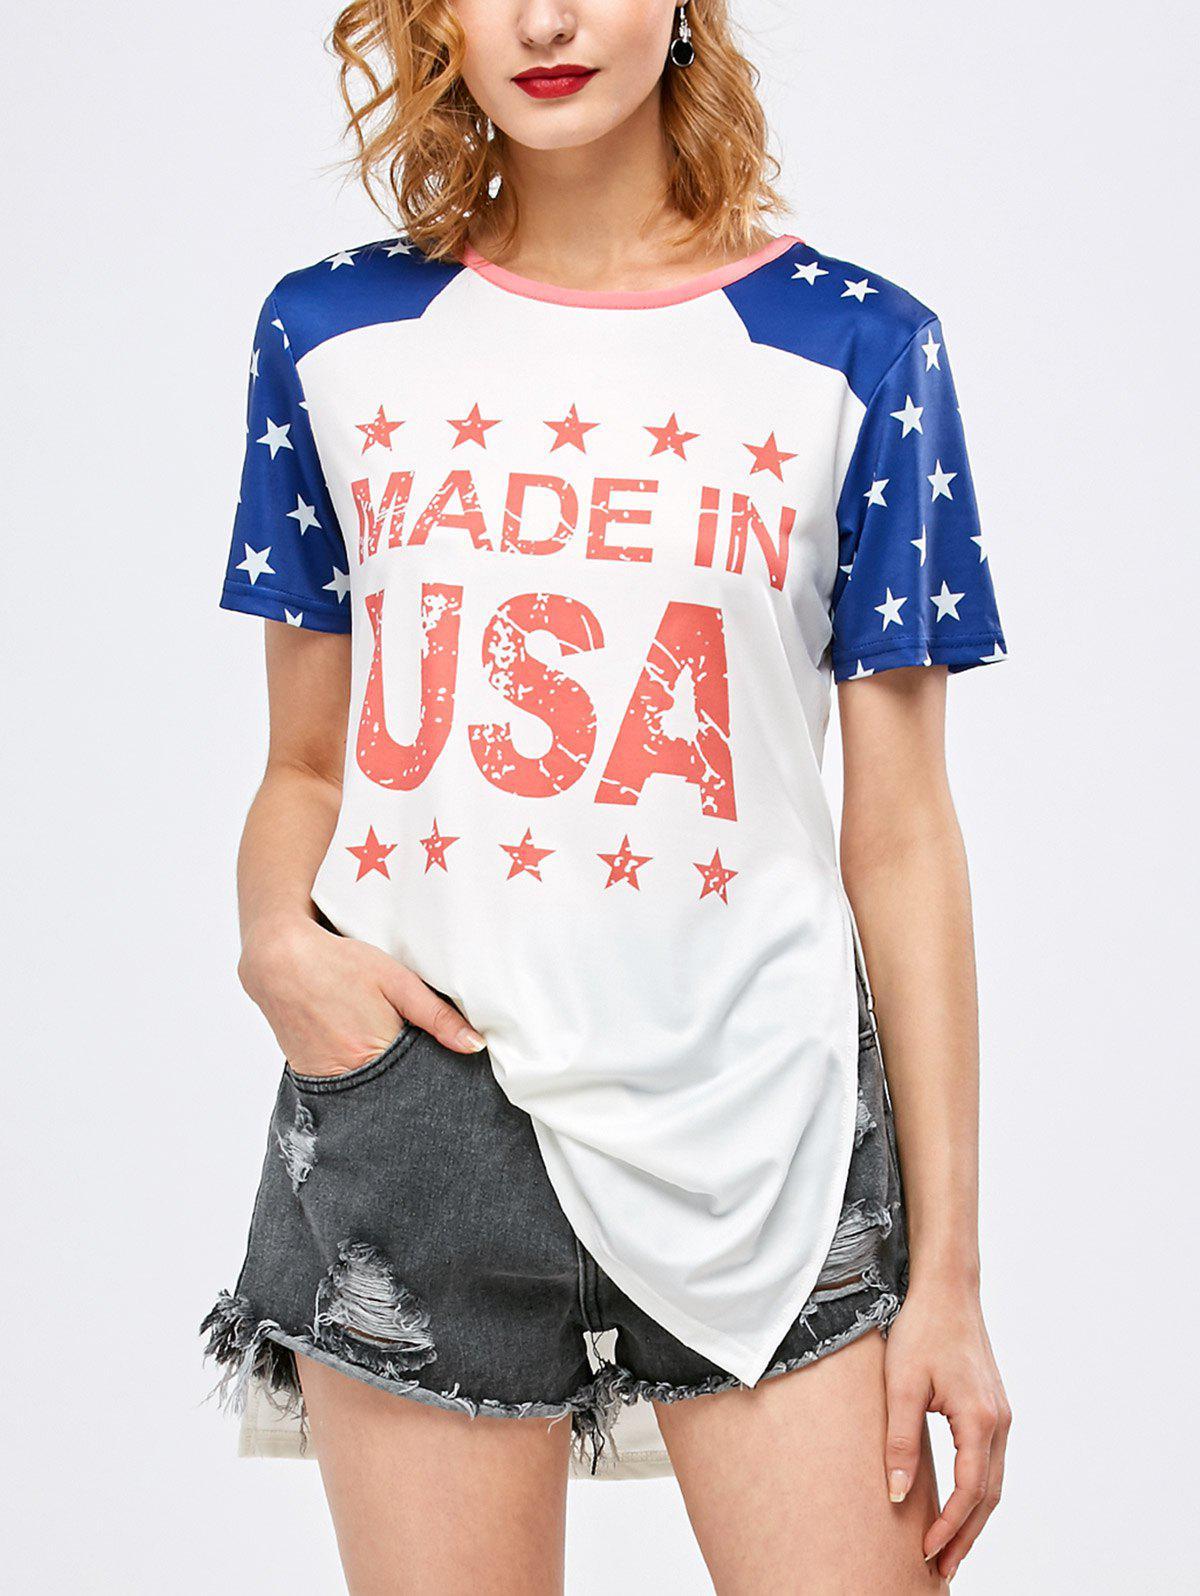 Side Slit Graphic Star Tunic T Shirt 204789204